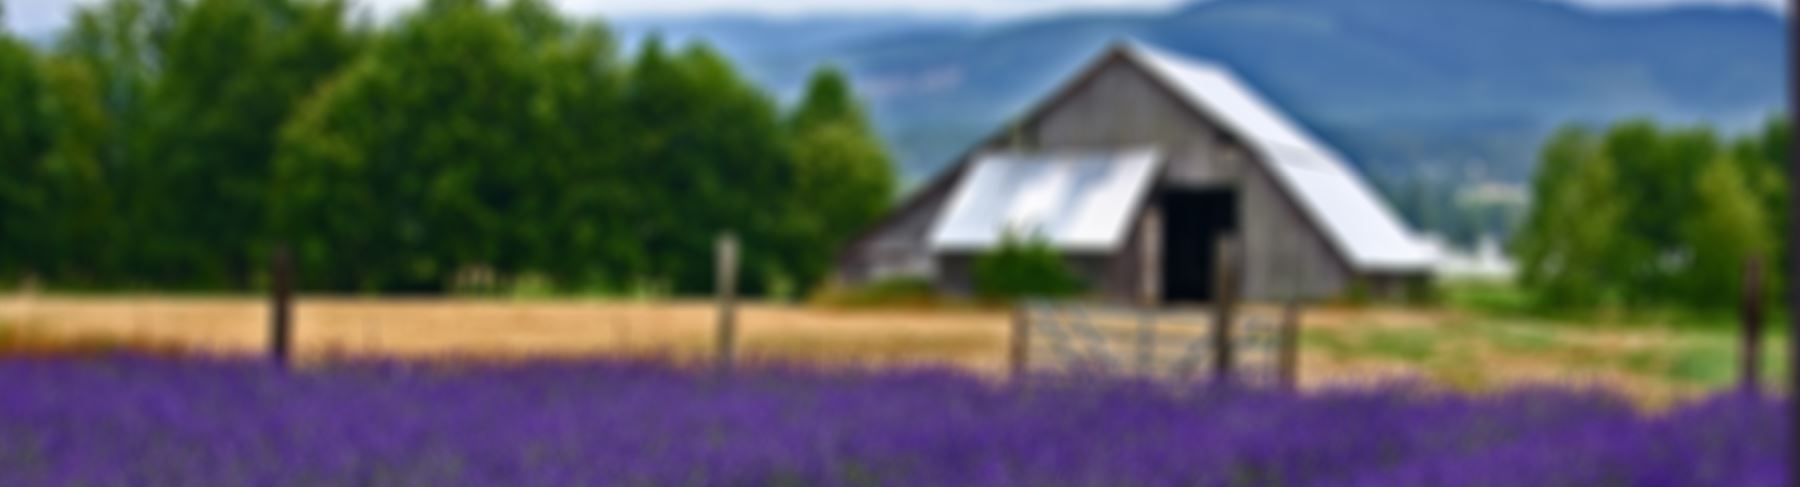 Sequim Lavender Weekend   Sequim Tourism, WA - Official Website